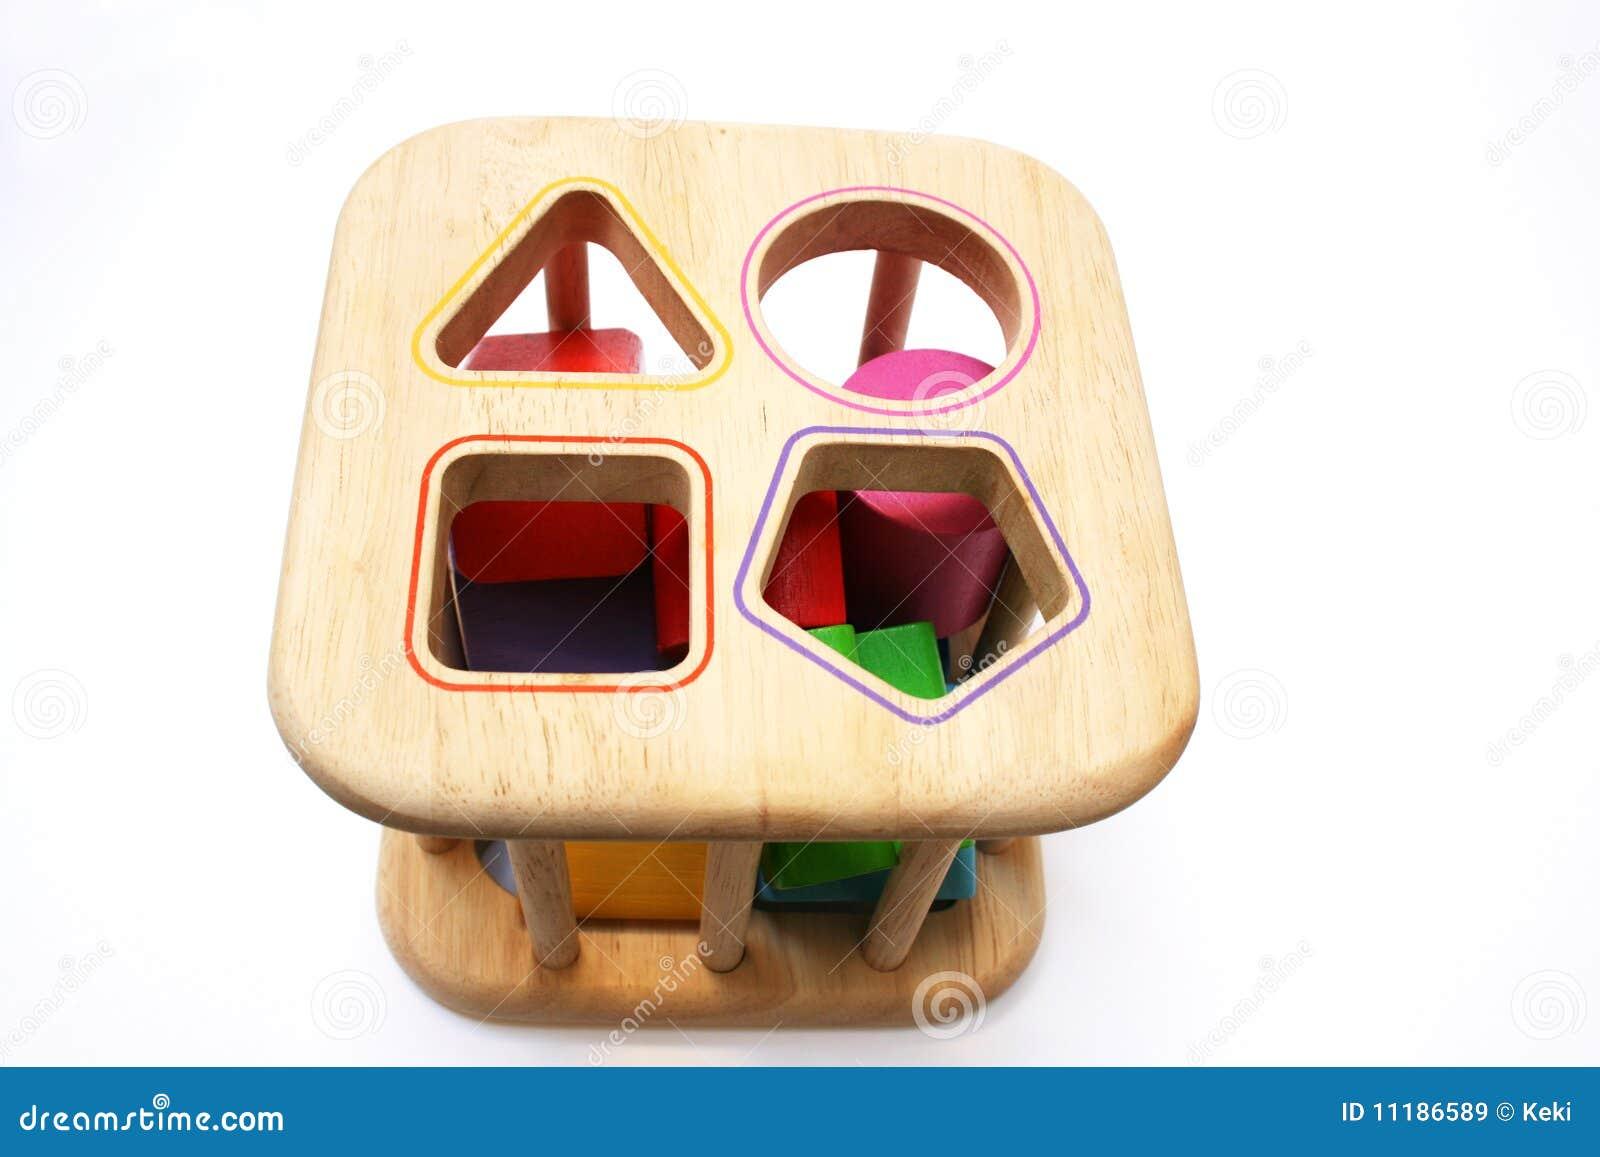 Baby shape puzzle toy stock image. Image of shapes ...